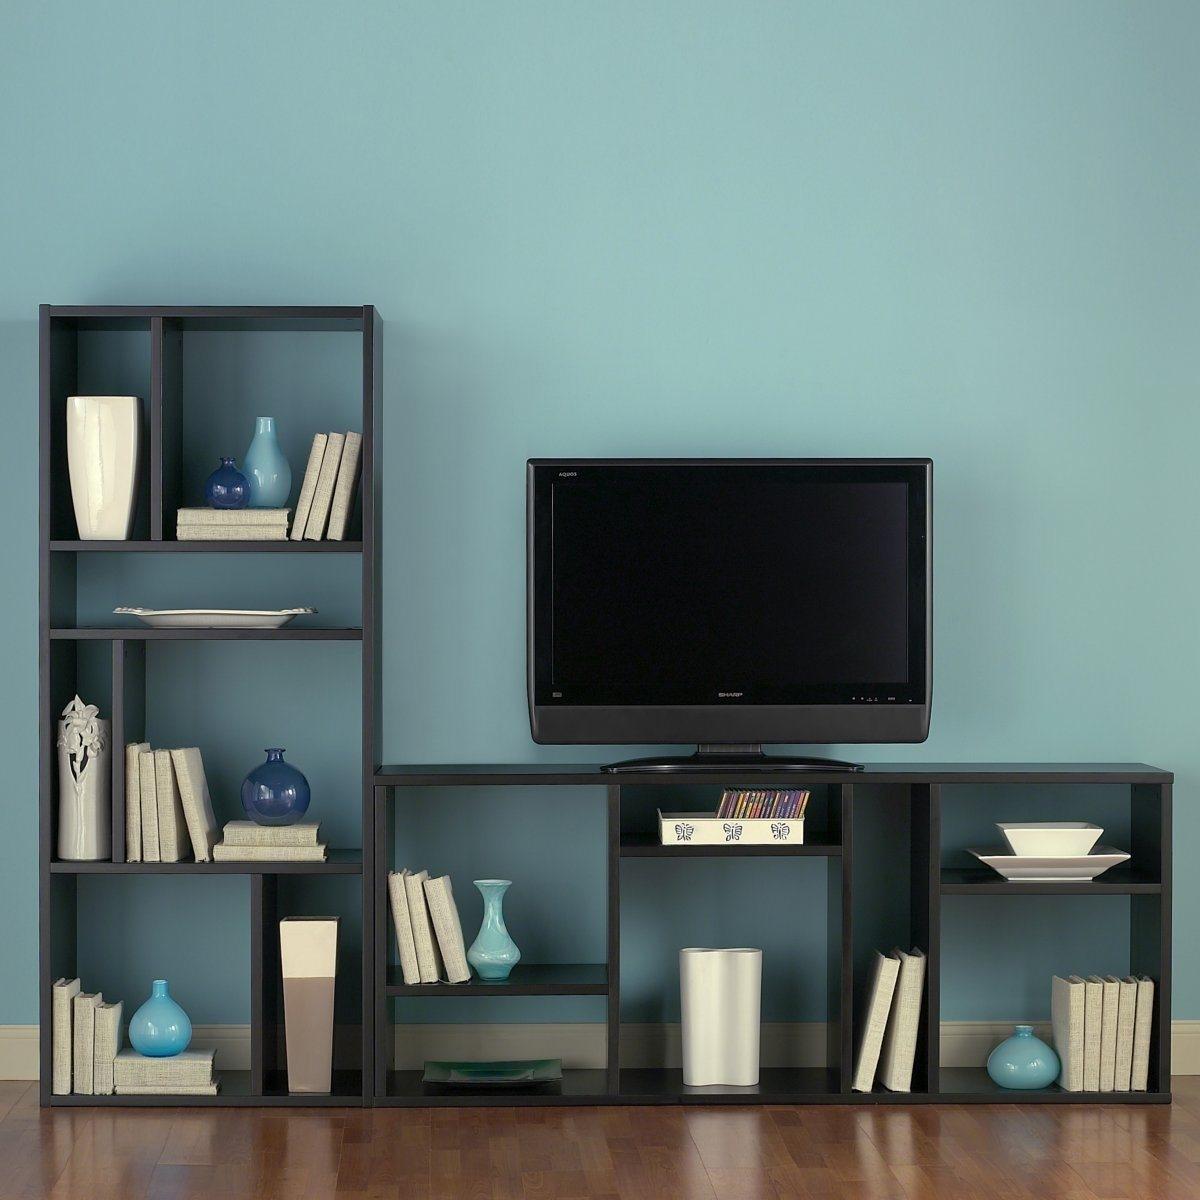 Tv Stands Inspire Black And White Tv Stand Bookshelf Design Ideas Inside Tv And Bookshelf (#13 of 15)